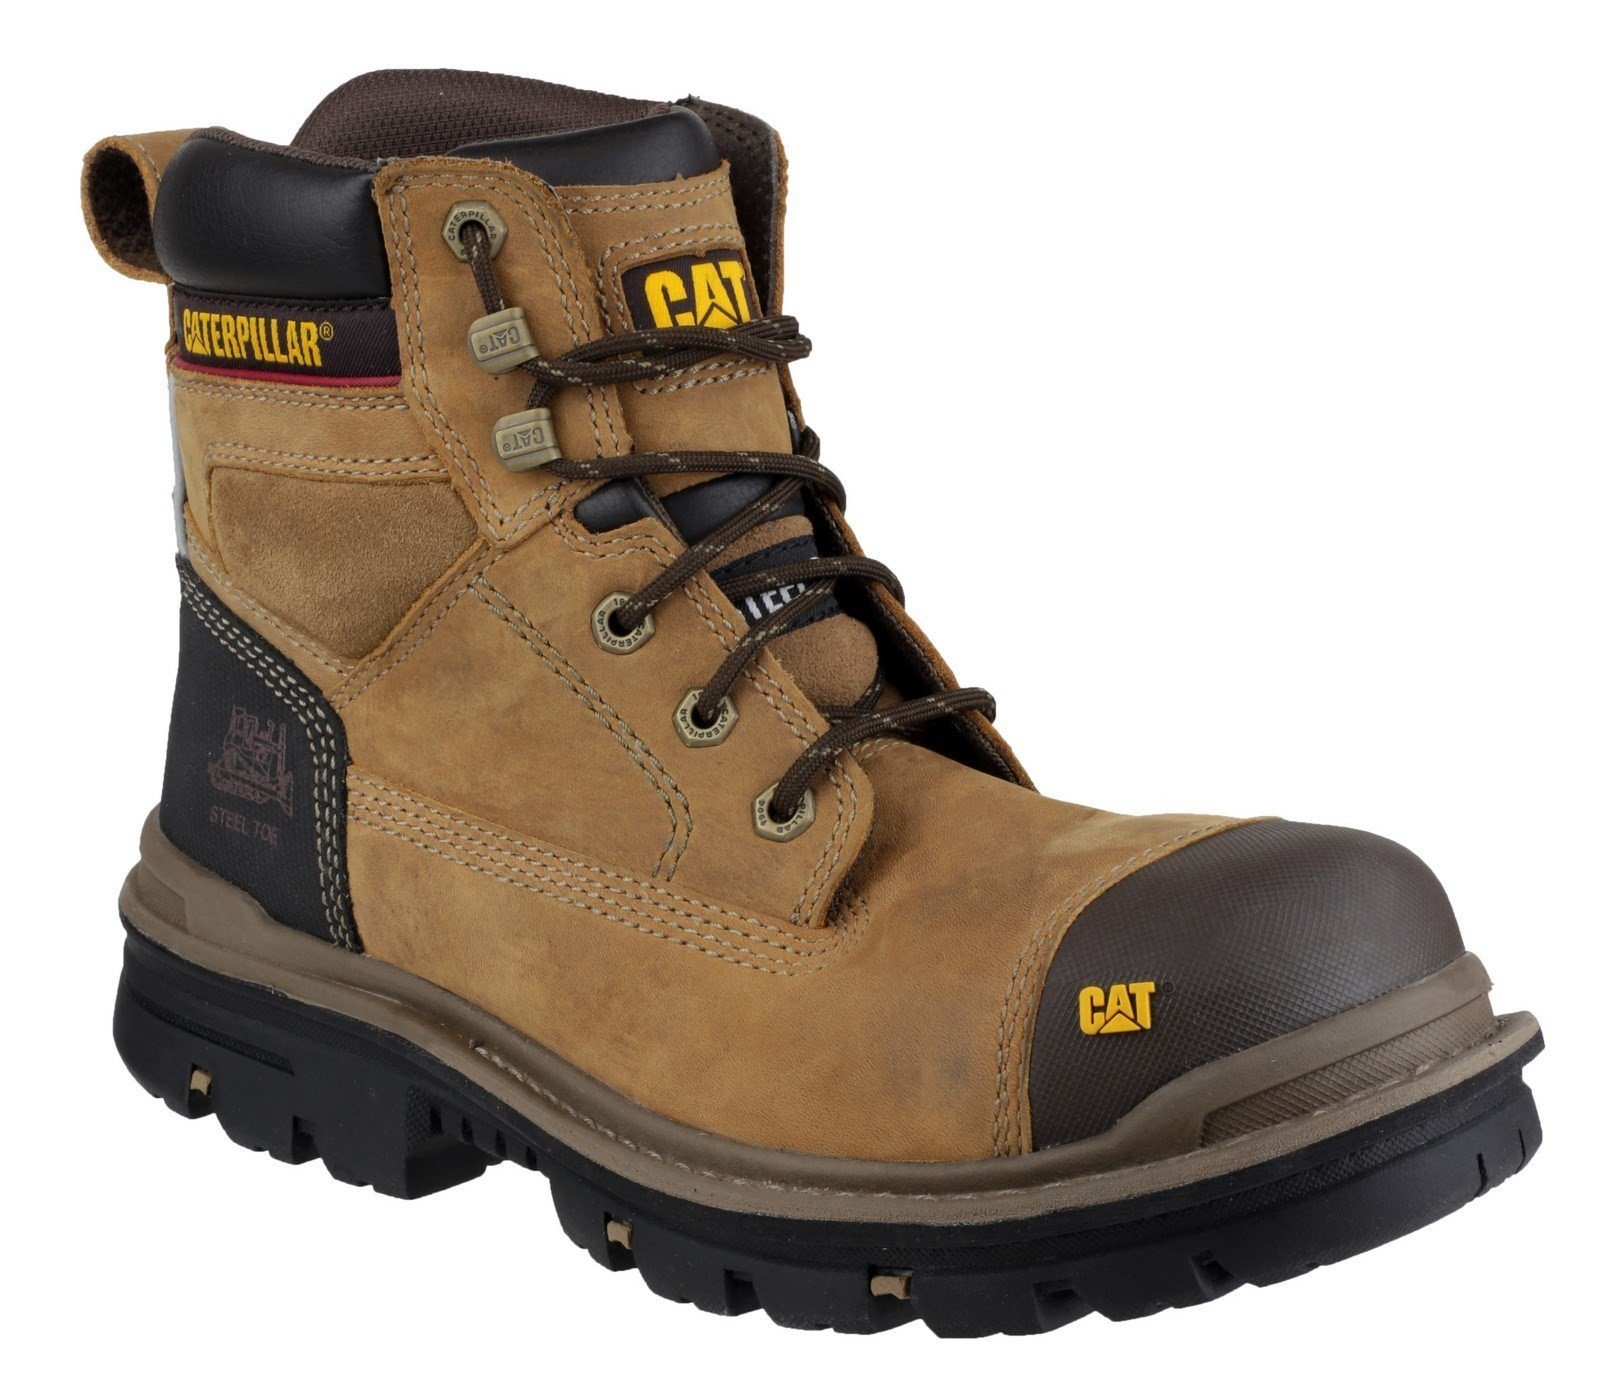 "Caterpillar Men's Gravel 6"" Safety Boot Beige 21618 - Beige 6"